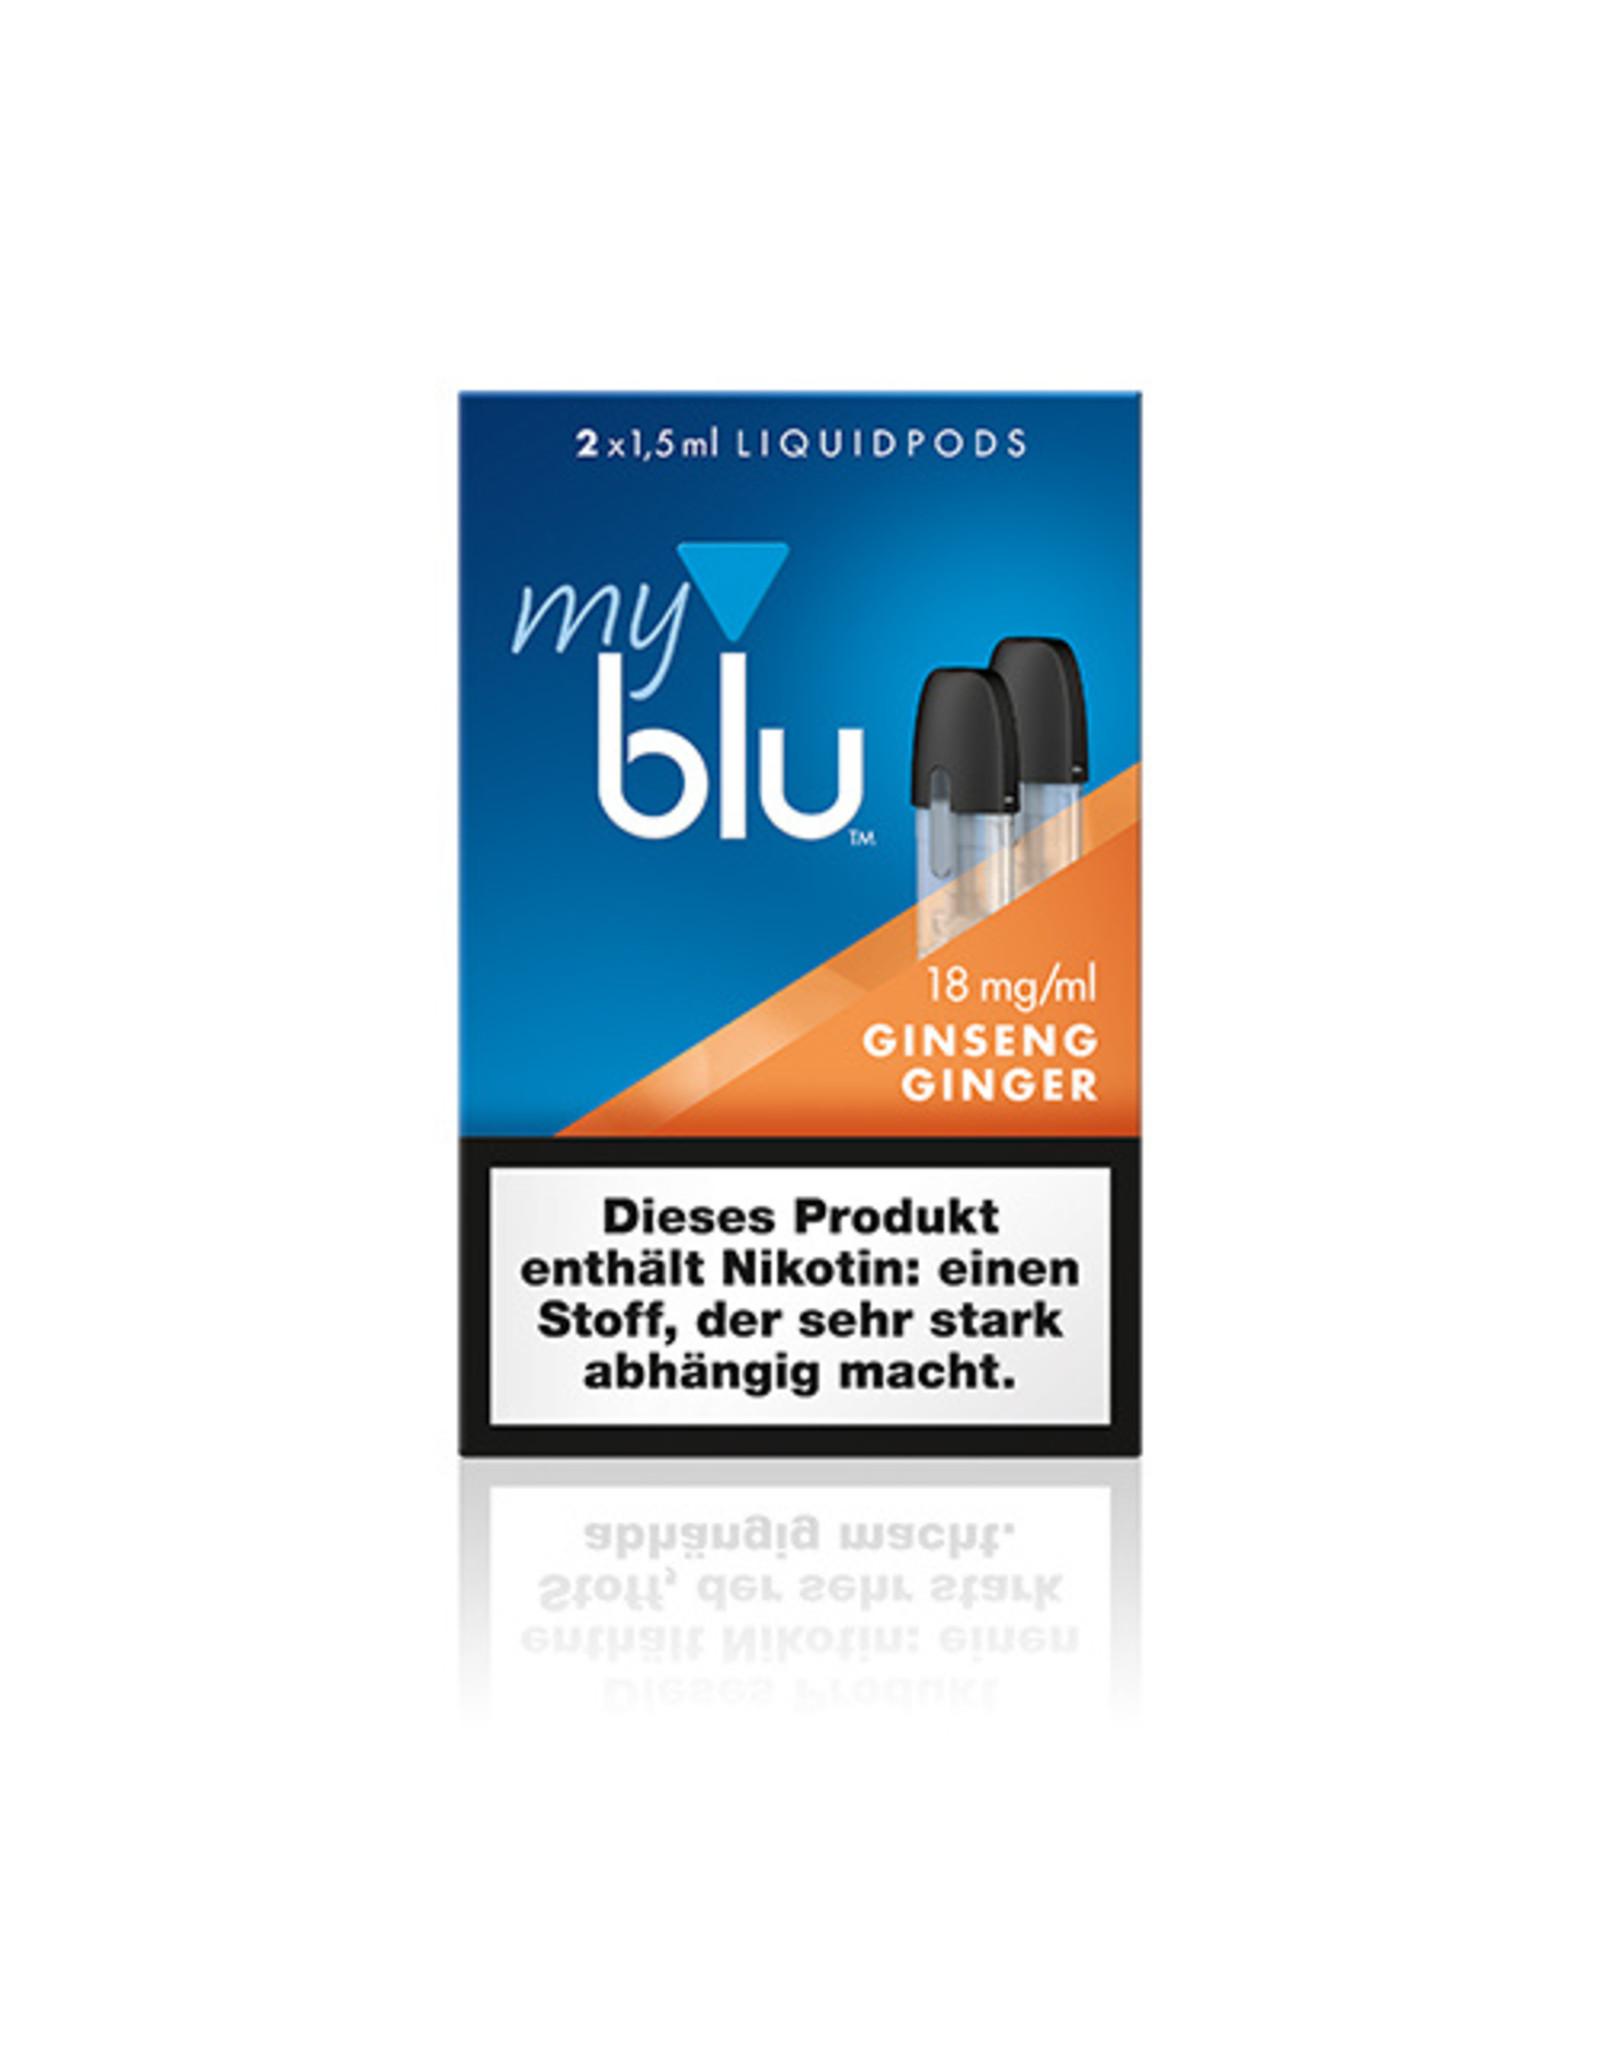 My Blu myblu GINSENG GINGER 18mg/ml LIQUIDPOD